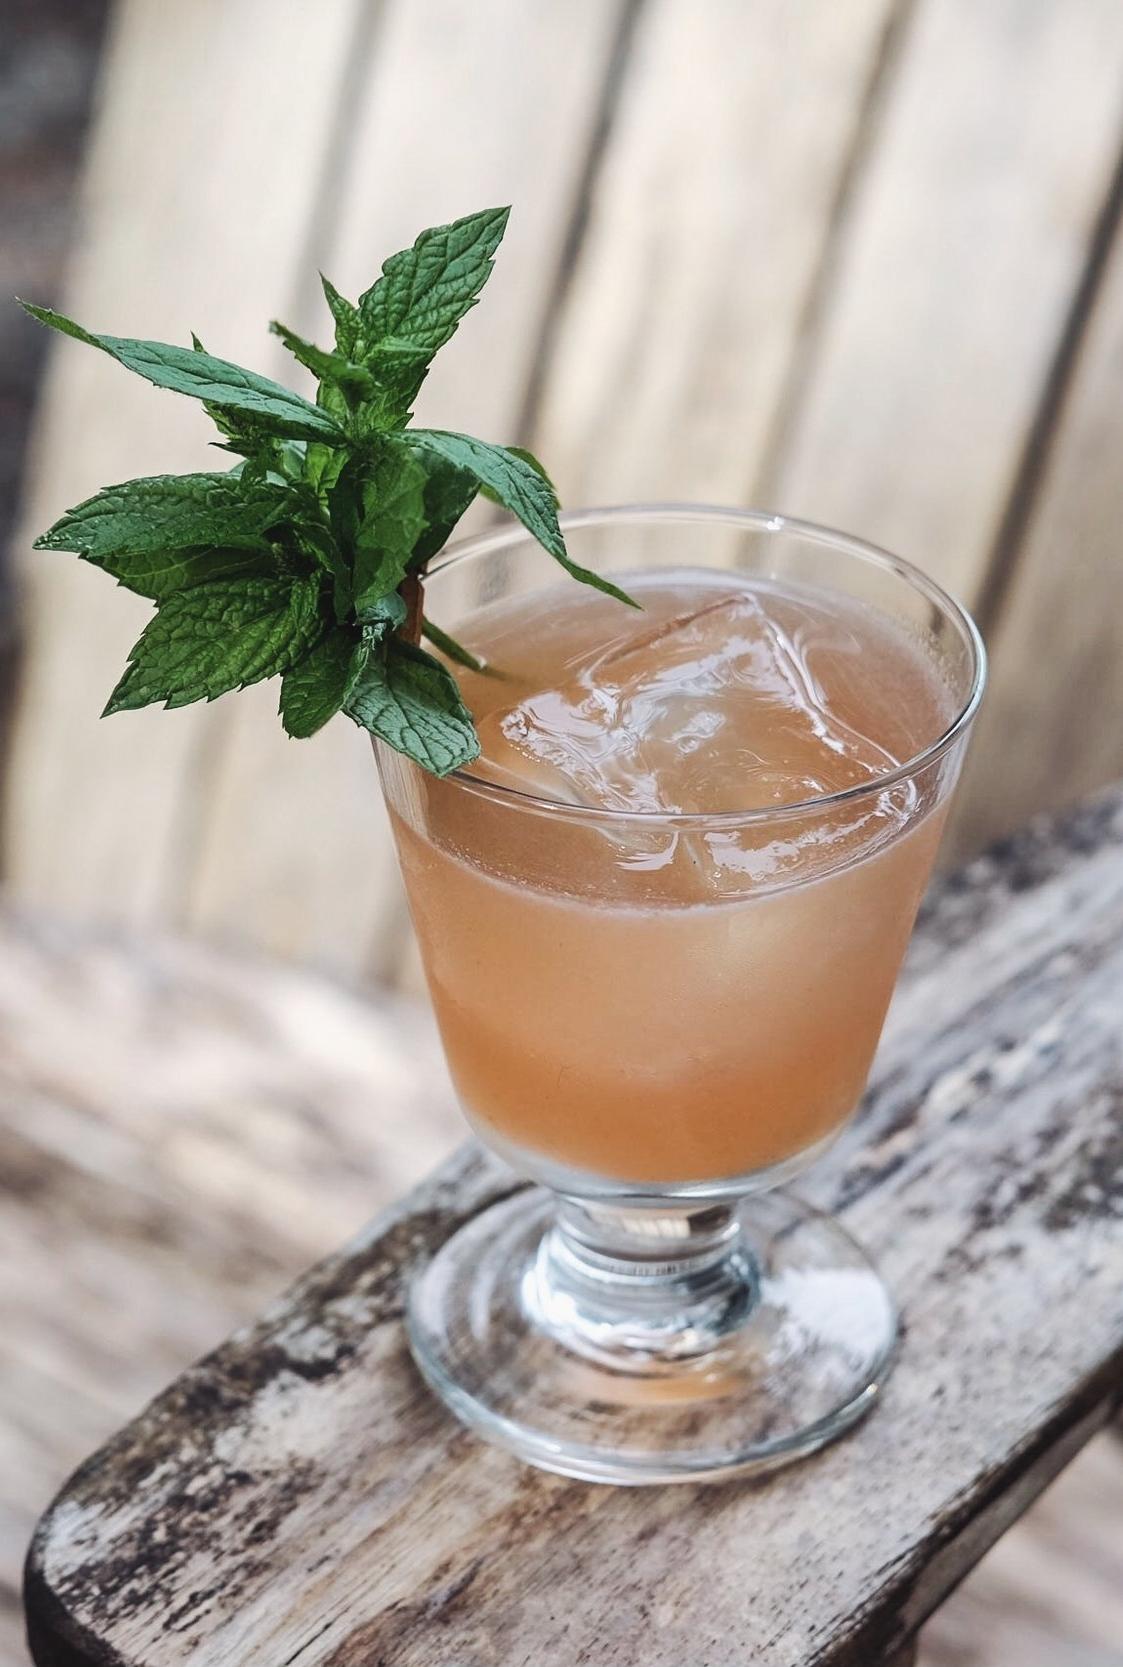 Half the Garden - 1½ oz Pear-infused vodka¾ oz fresh lemon juice3 mint leaves3-4 blueberries¼ oz honey simple syrup